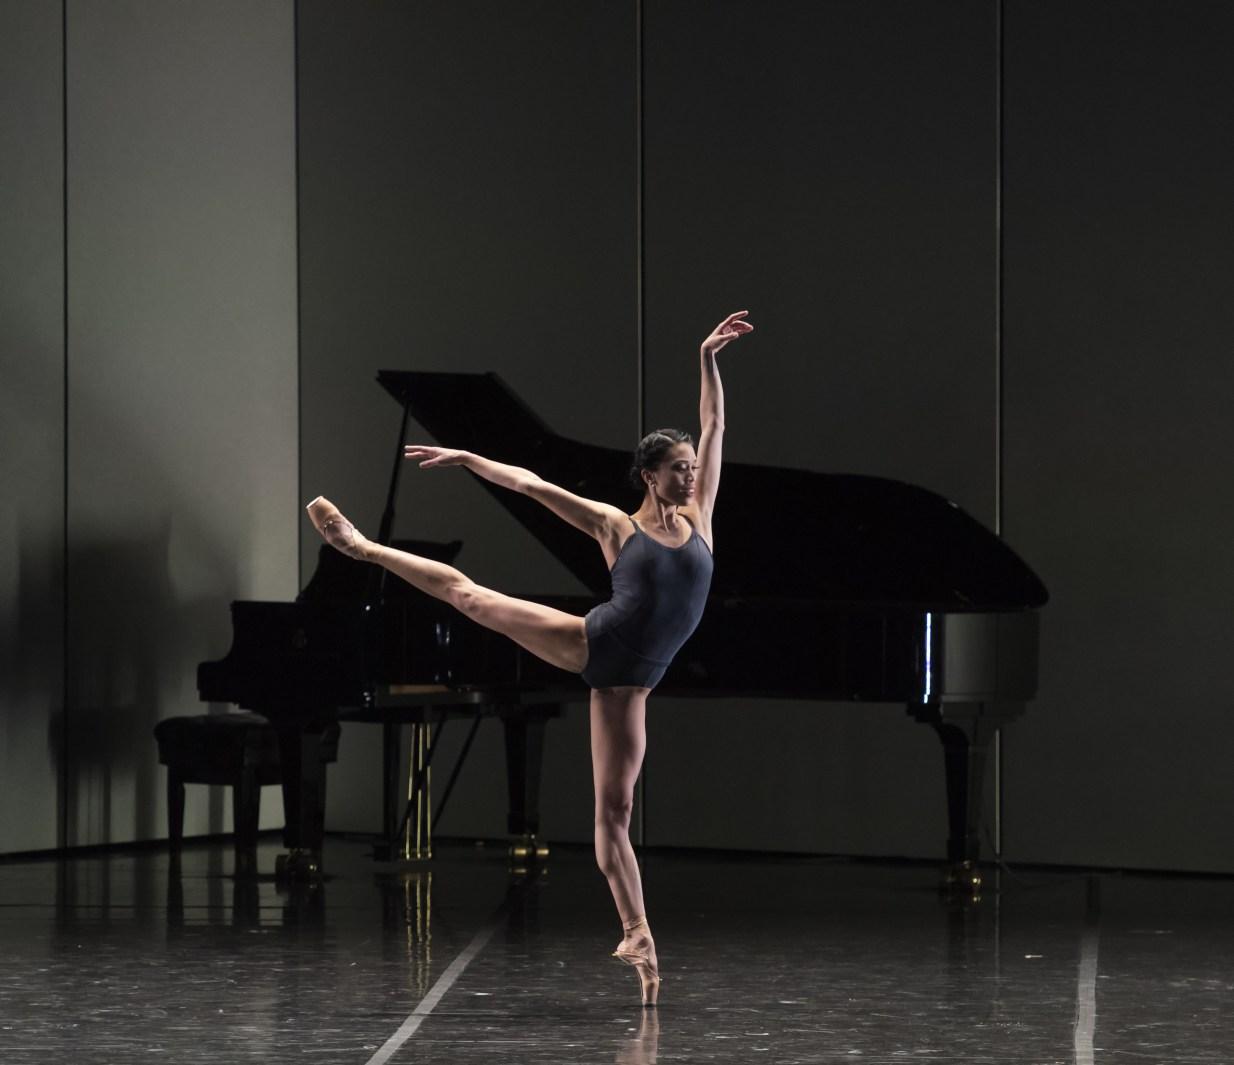 Lia Cirio of Boston Ballet in José Martinez's Resonance; photo by Gene Schiavone, courtesy Boston Ballet